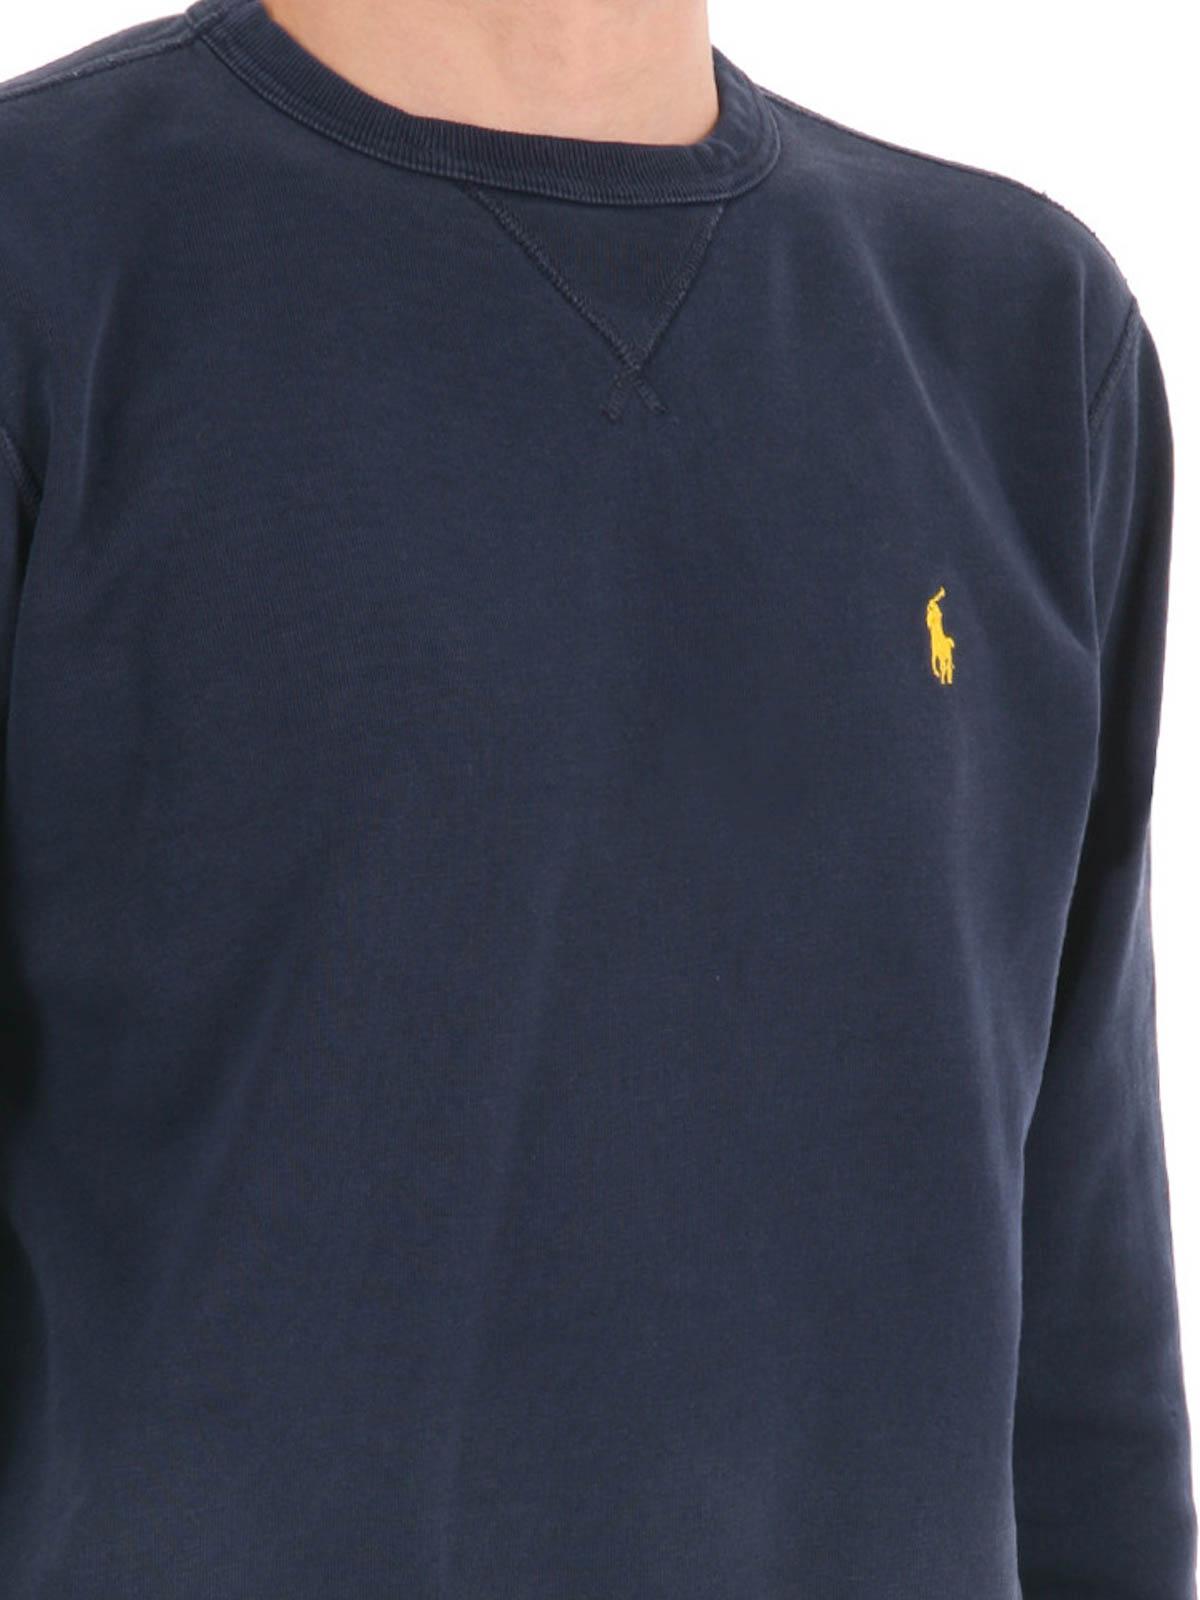 Buy Gildan Men's Fleece Crewneck Sweatshirt: Shop top fashion brands Sweatshirts at failvideo.ml FREE DELIVERY and Returns possible on eligible purchases/5(K).